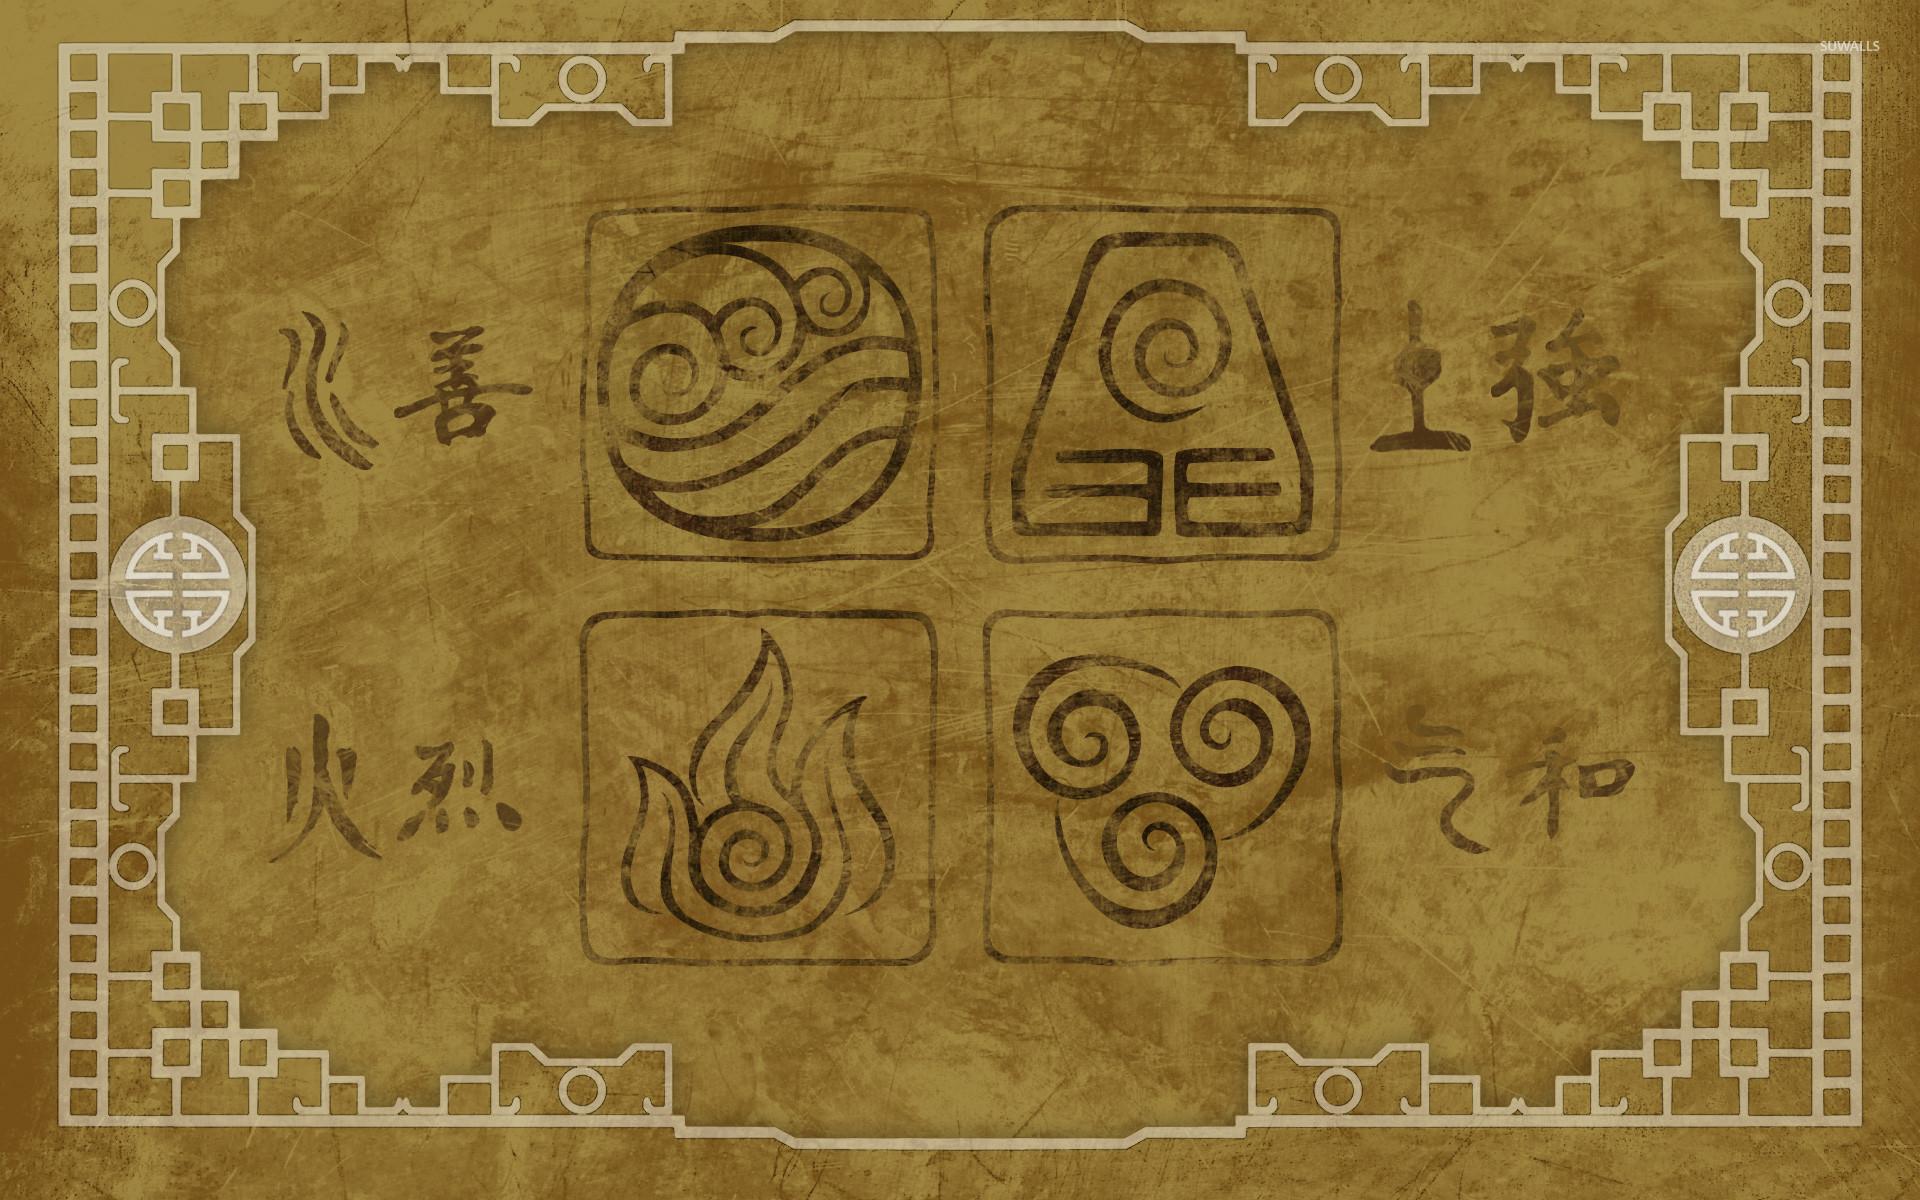 Avatar Aang Wallpaper Hd Avatars From Avatar The Last Airbender Wallpaper Anime